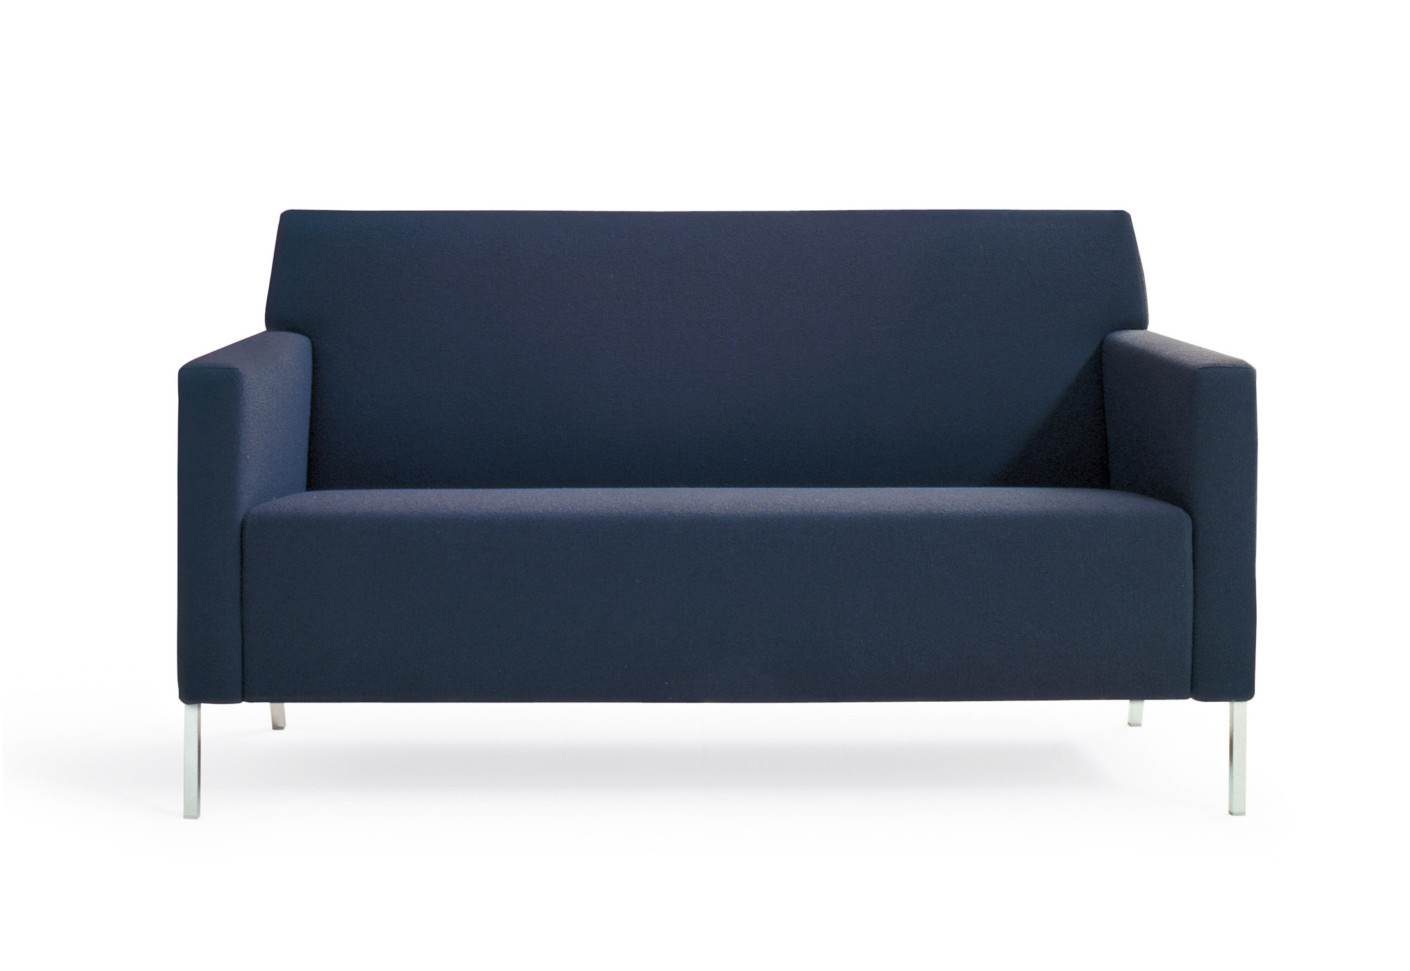 sofa steel lorenzo gray leather bed by moroso stylepark